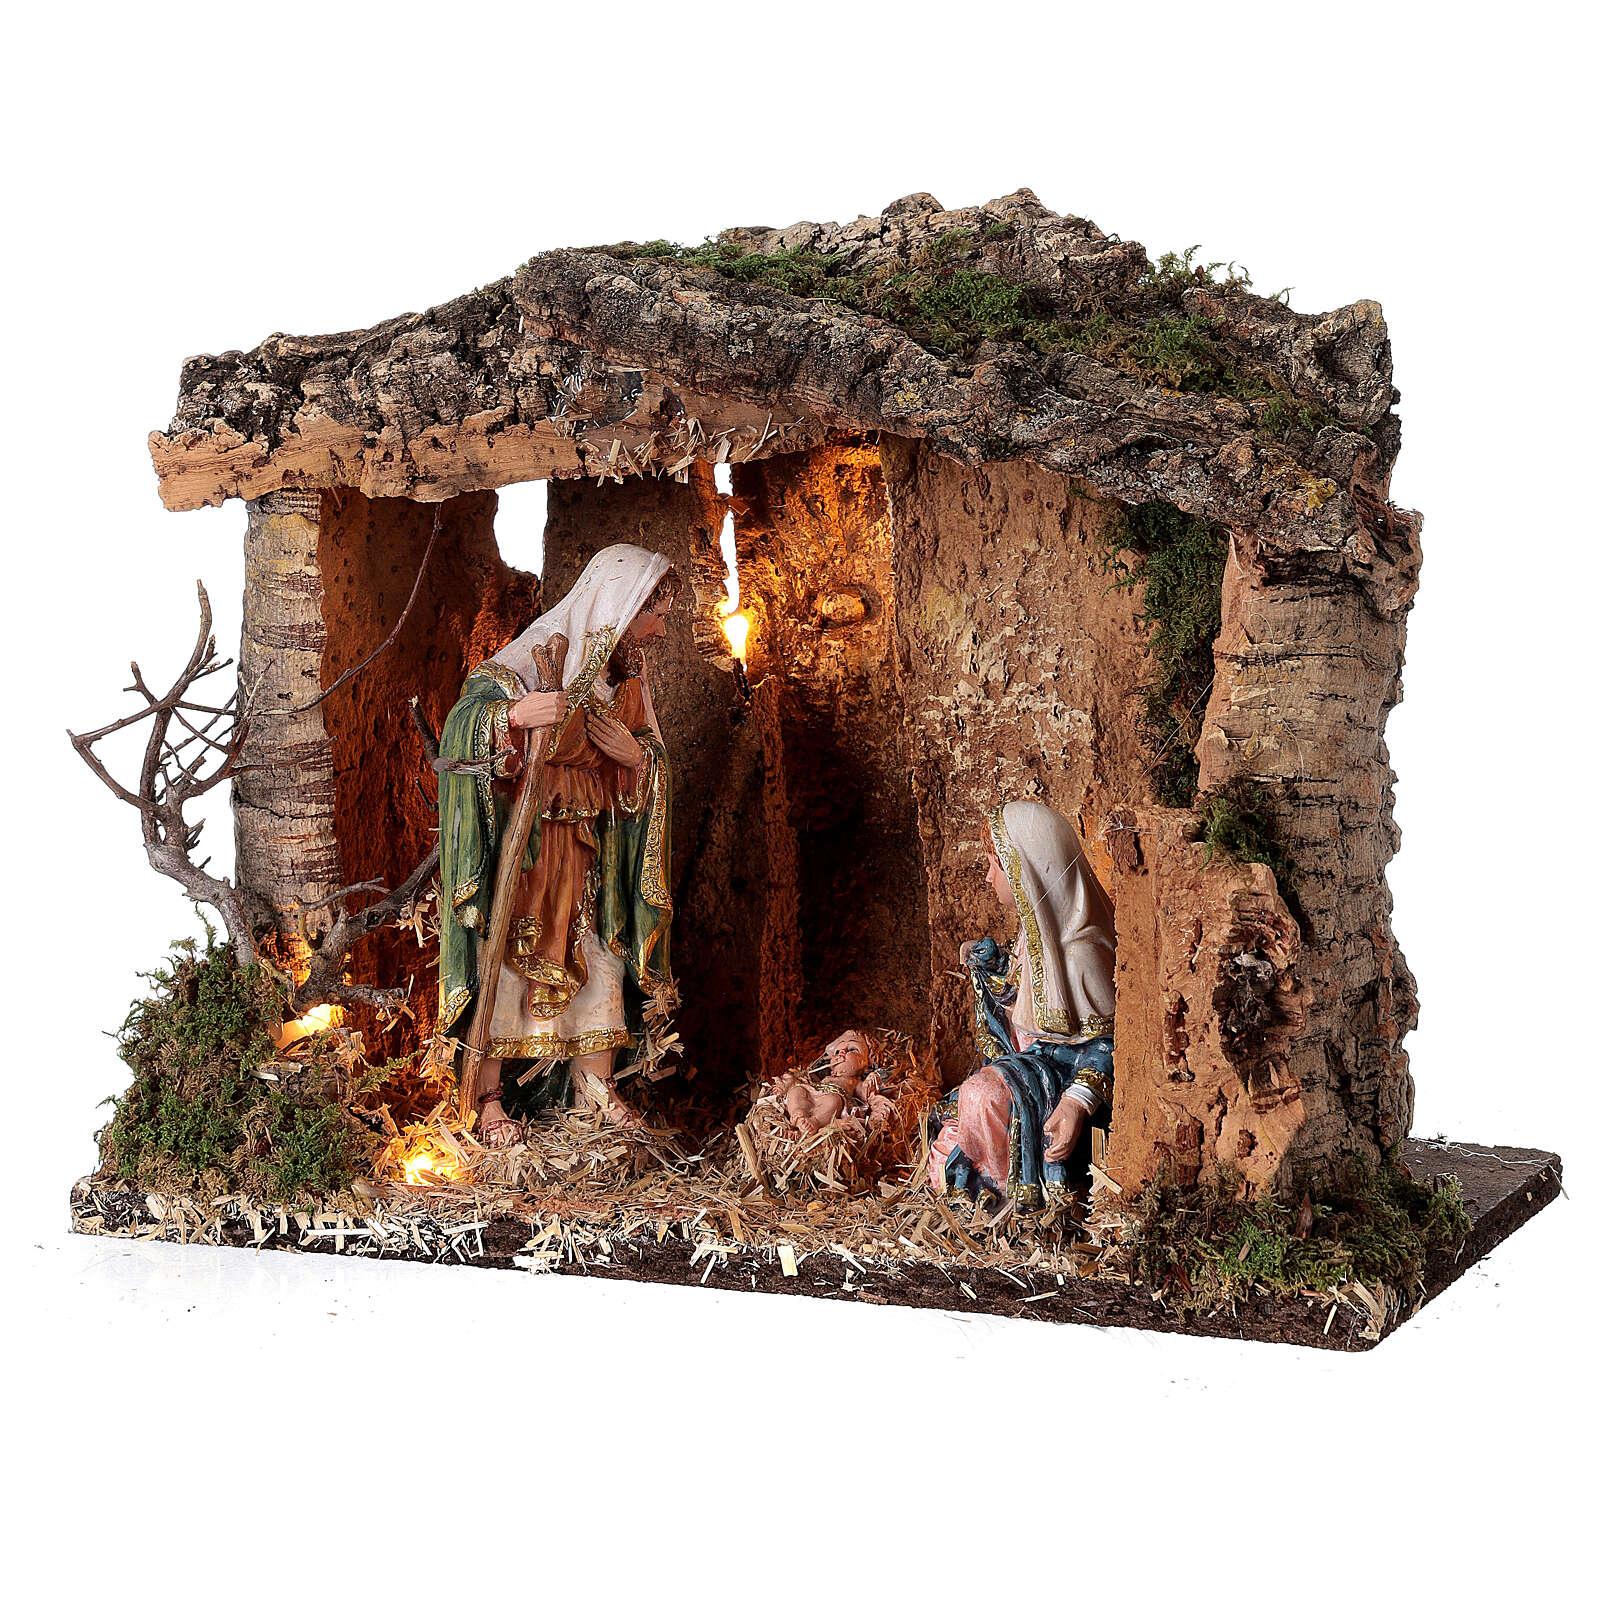 Illuminated wooden hut 25x30x20 cm Nativity Scene 16 cm 4